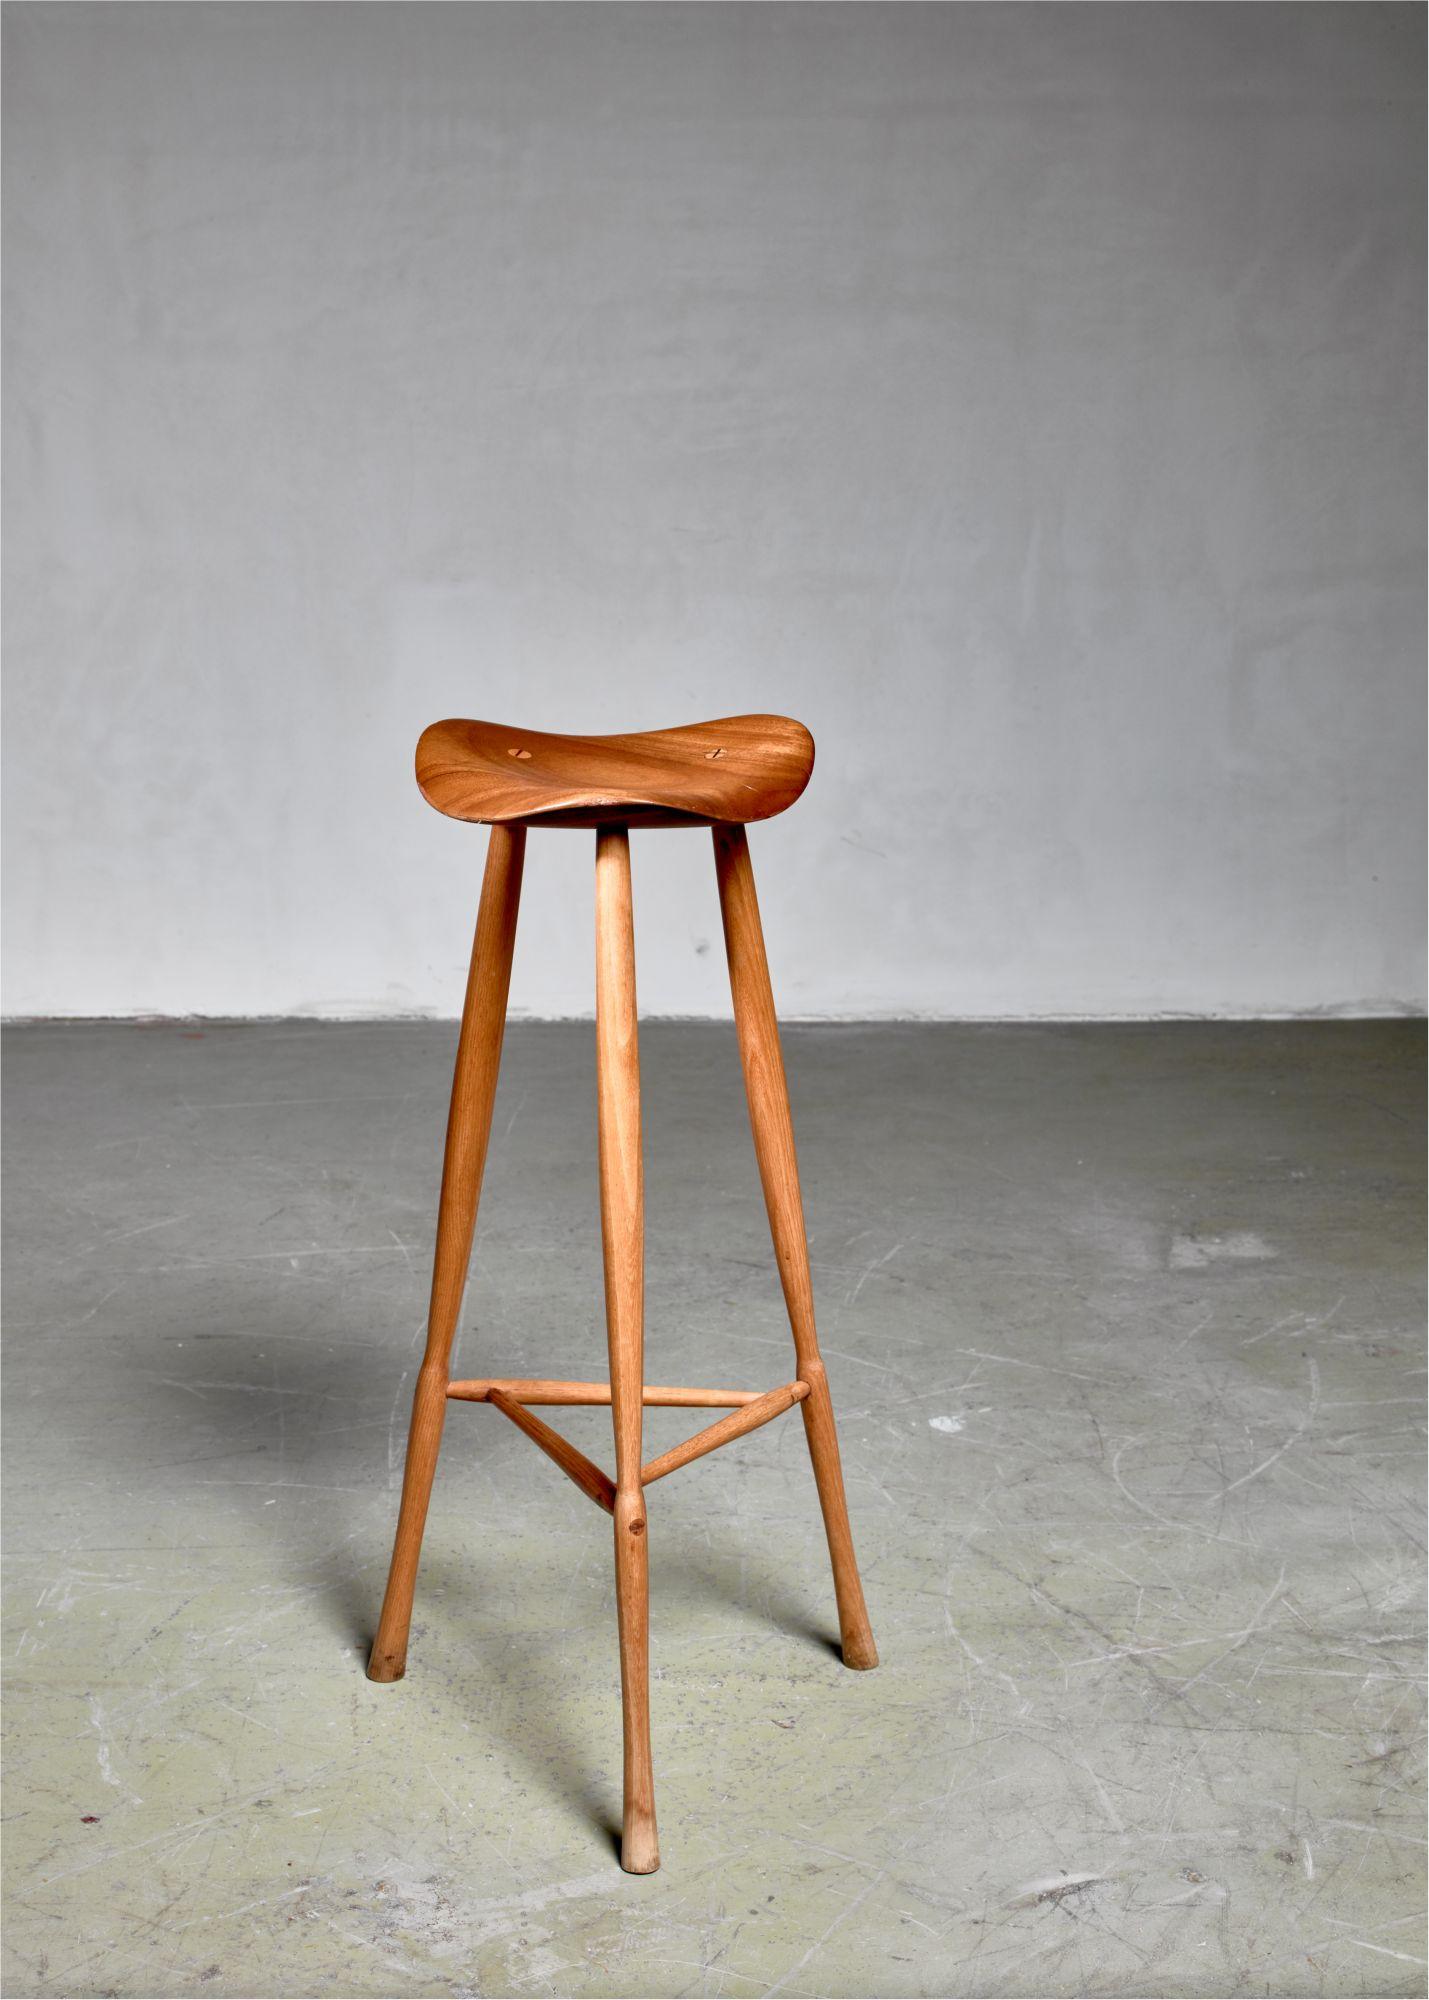 Prime Karl Seemuller Studio Craft Teak Stool Usa 1973 Beatyapartments Chair Design Images Beatyapartmentscom